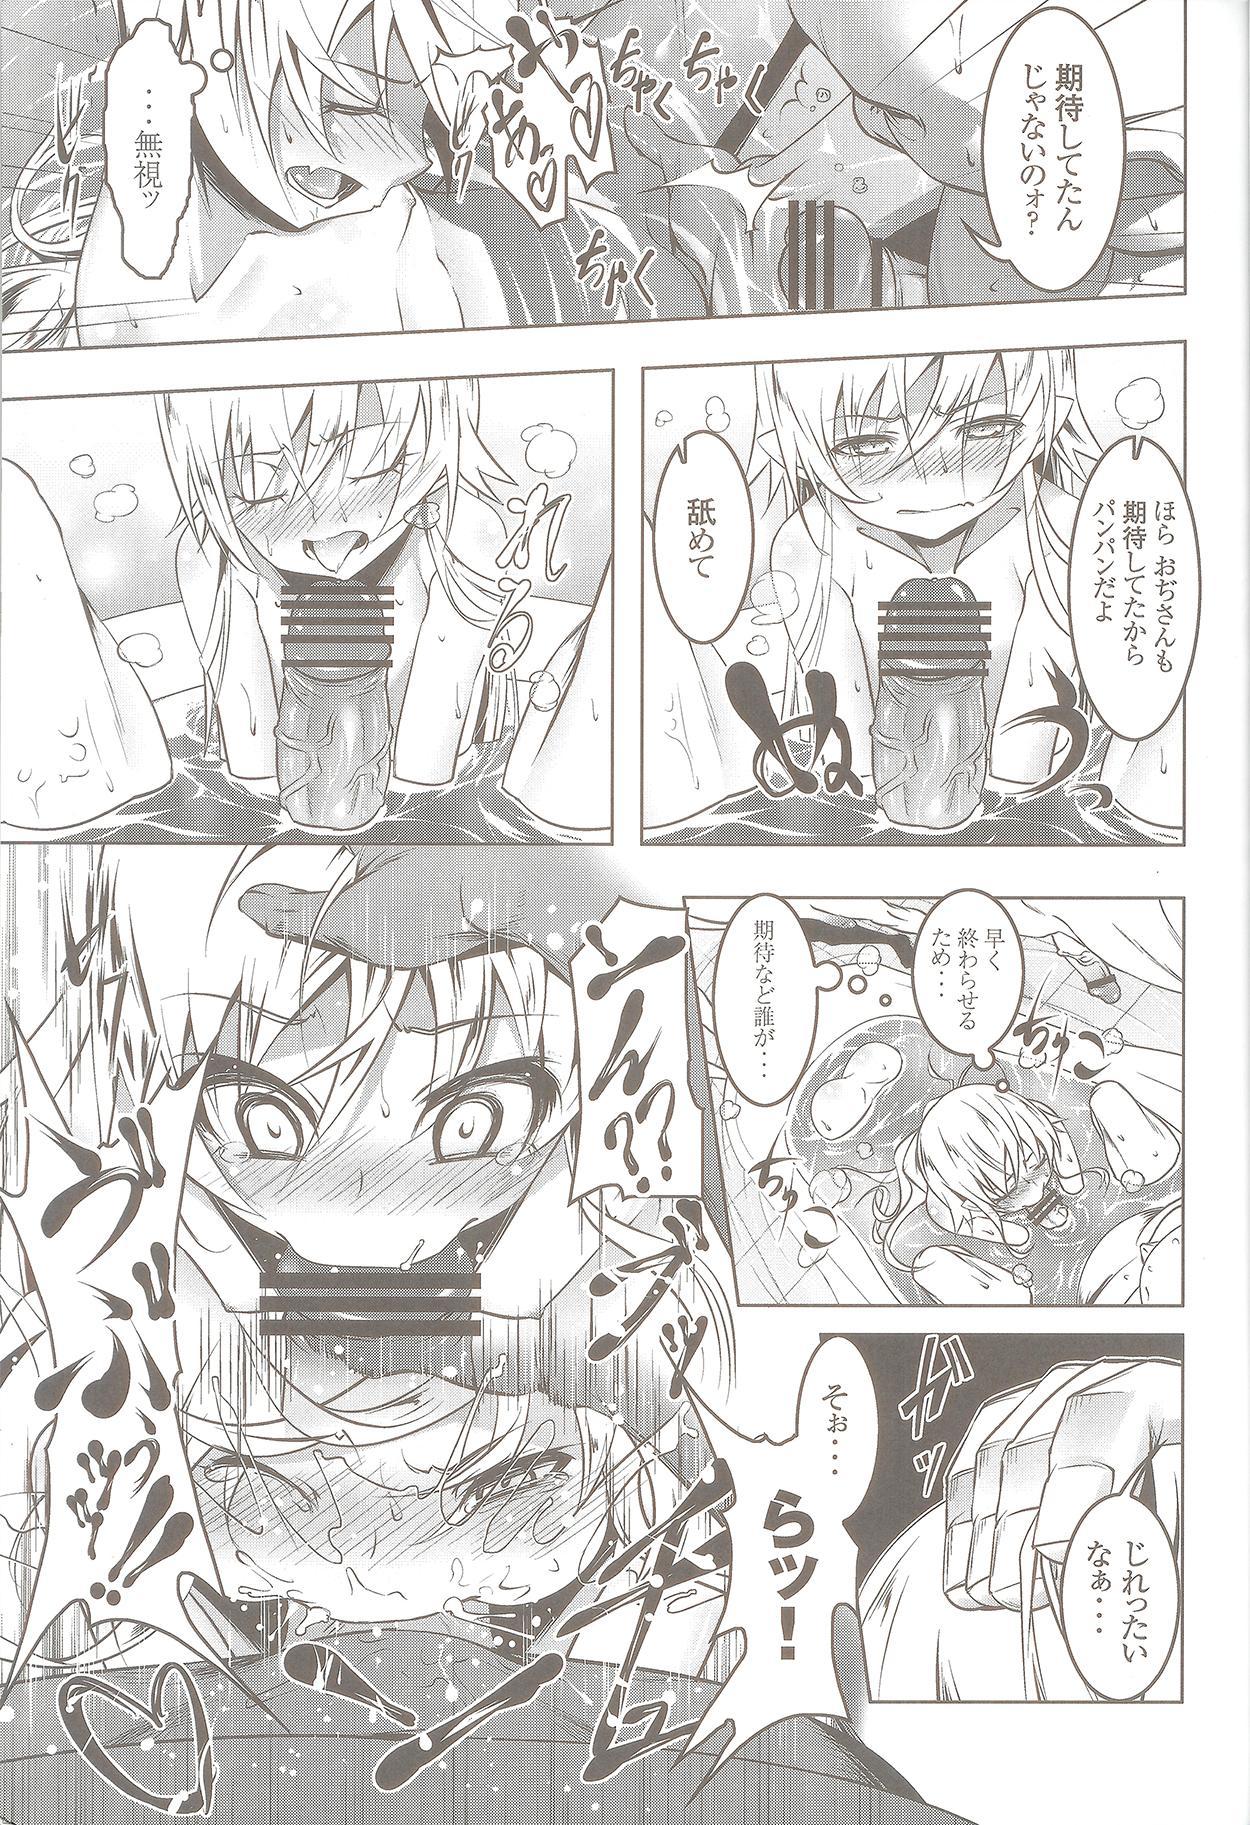 Netoraregatari San 14